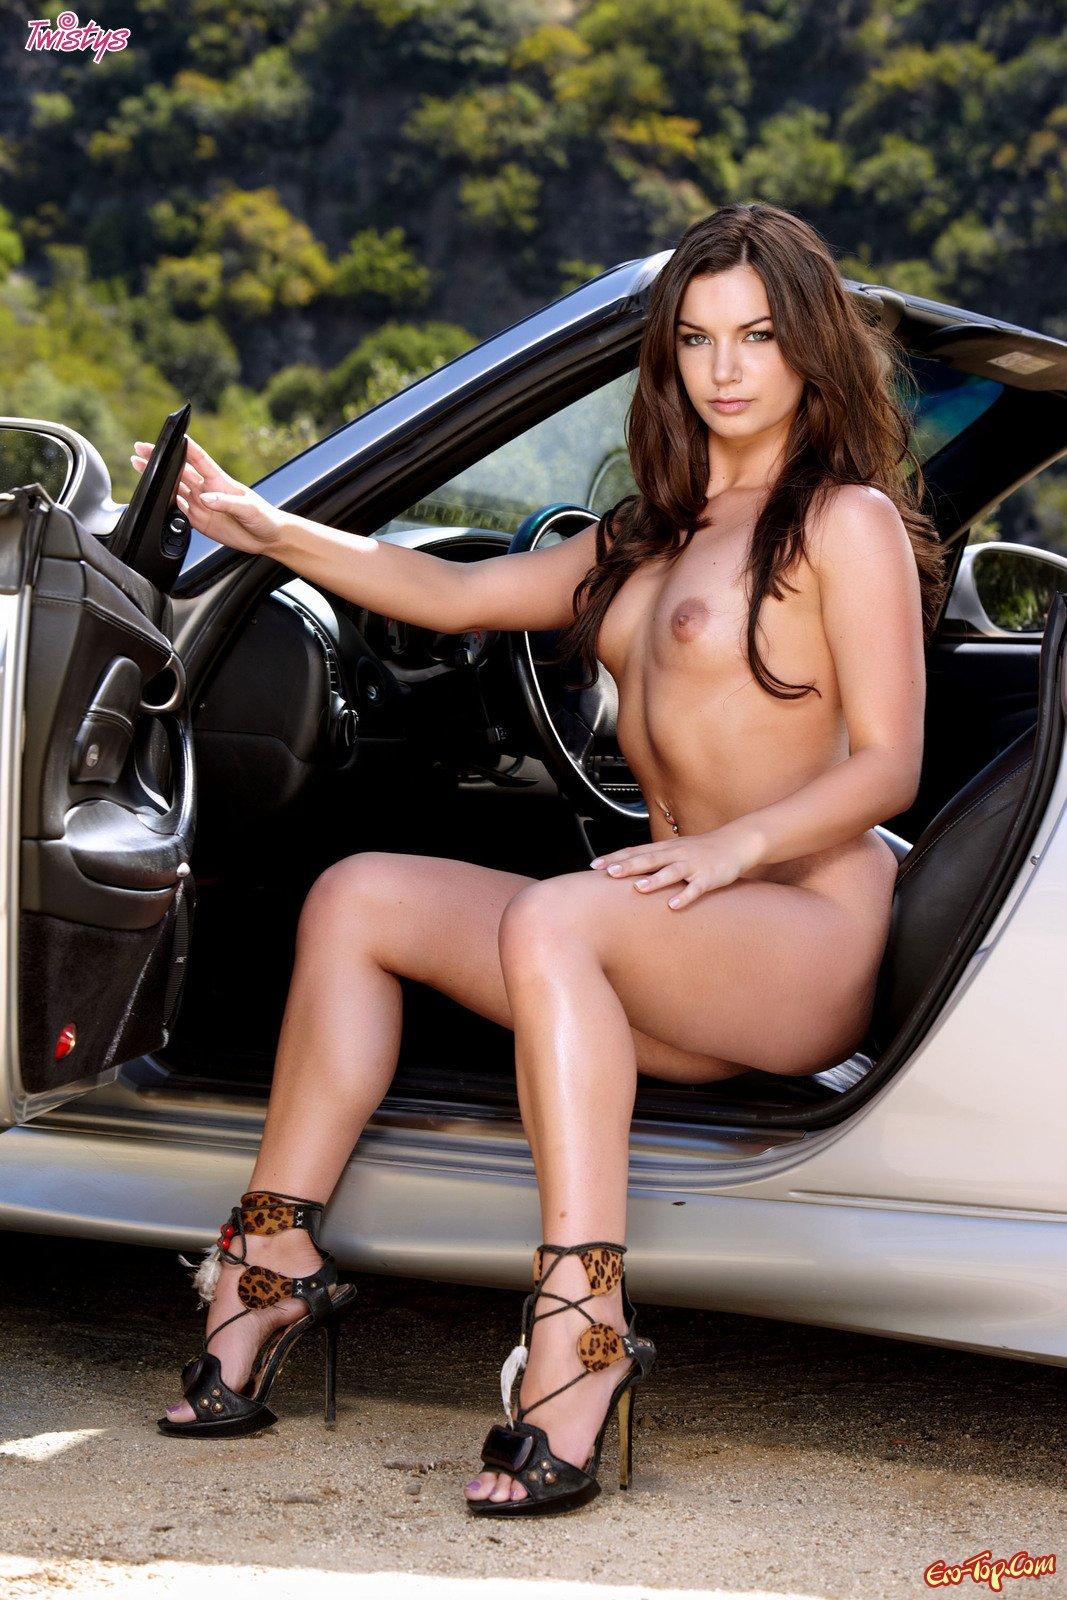 Amber Addison голая в автомобиле